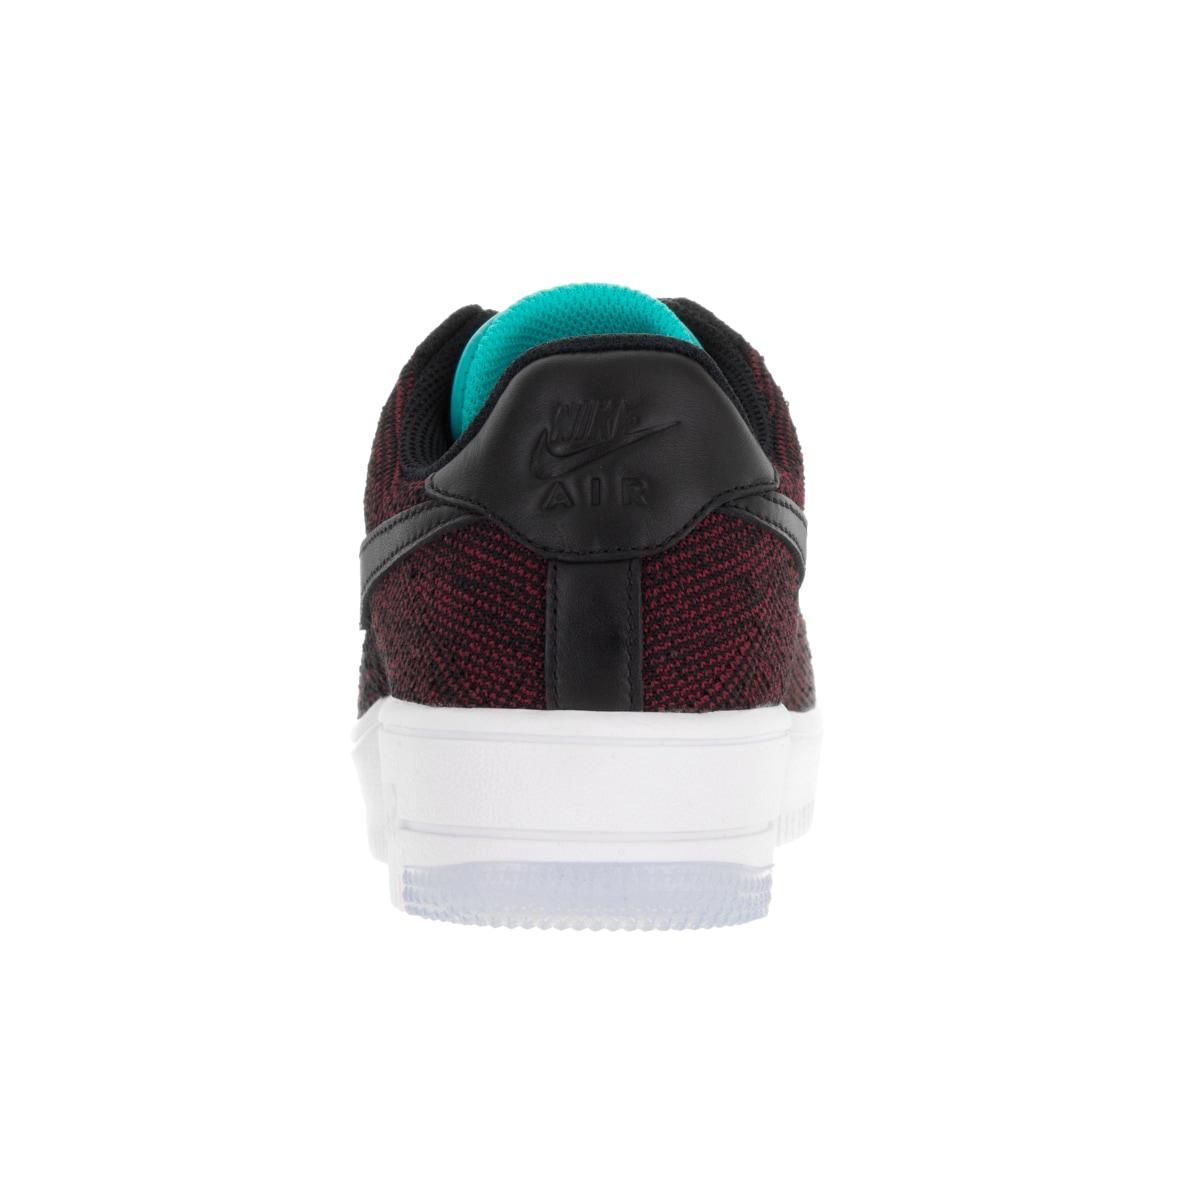 buy online b0d60 7d1b5 Nike Women's AF1 Flyknit Multicolored Fabric Casual Shoe